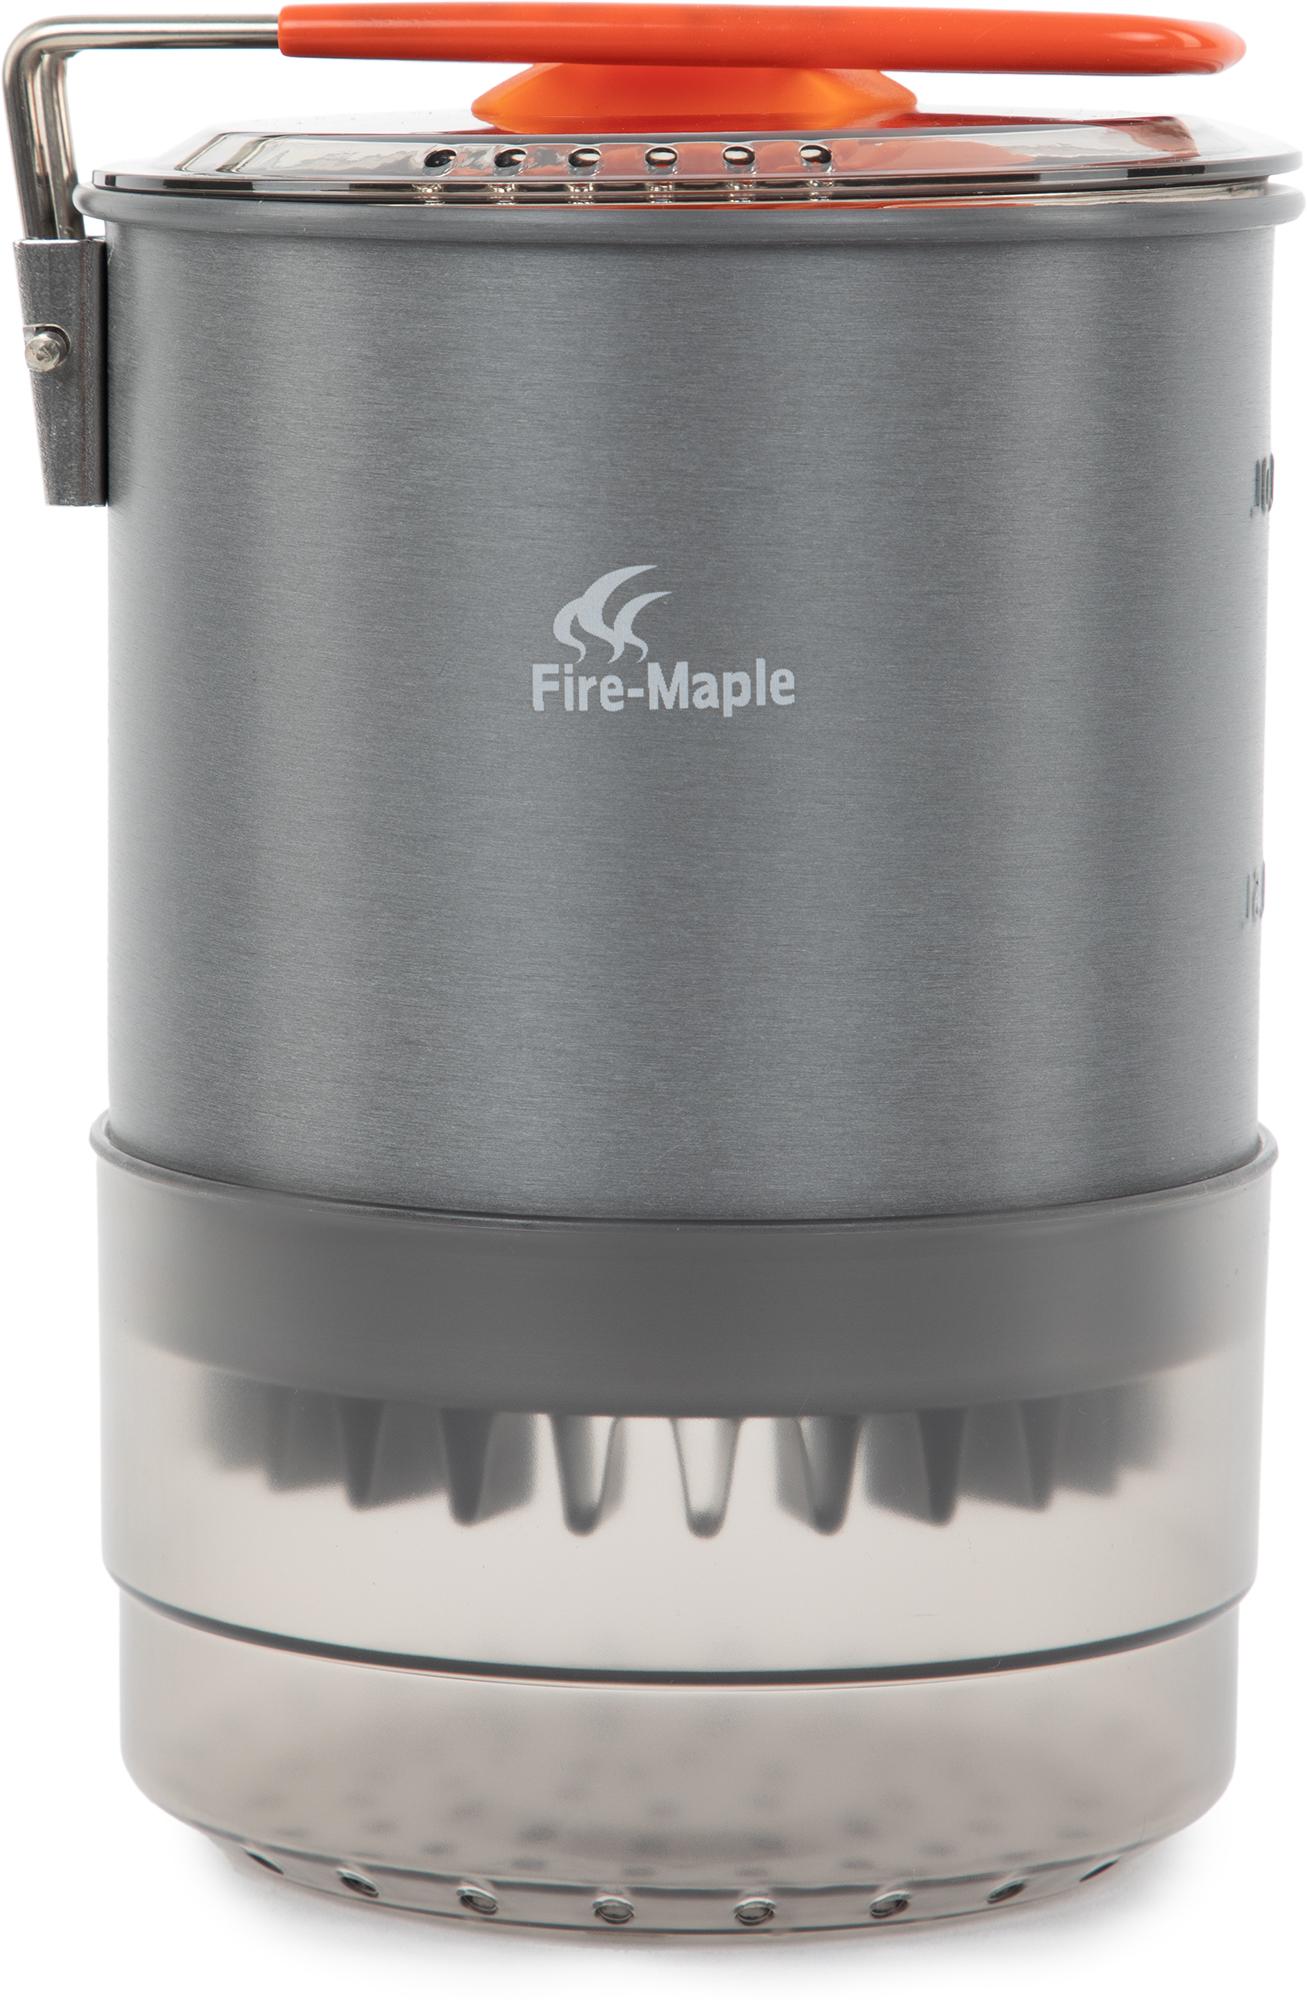 Fire-Maple Котел анодированный Fire-Maple ISLAND набор посуды fire maple fire maple титановой horizon 1